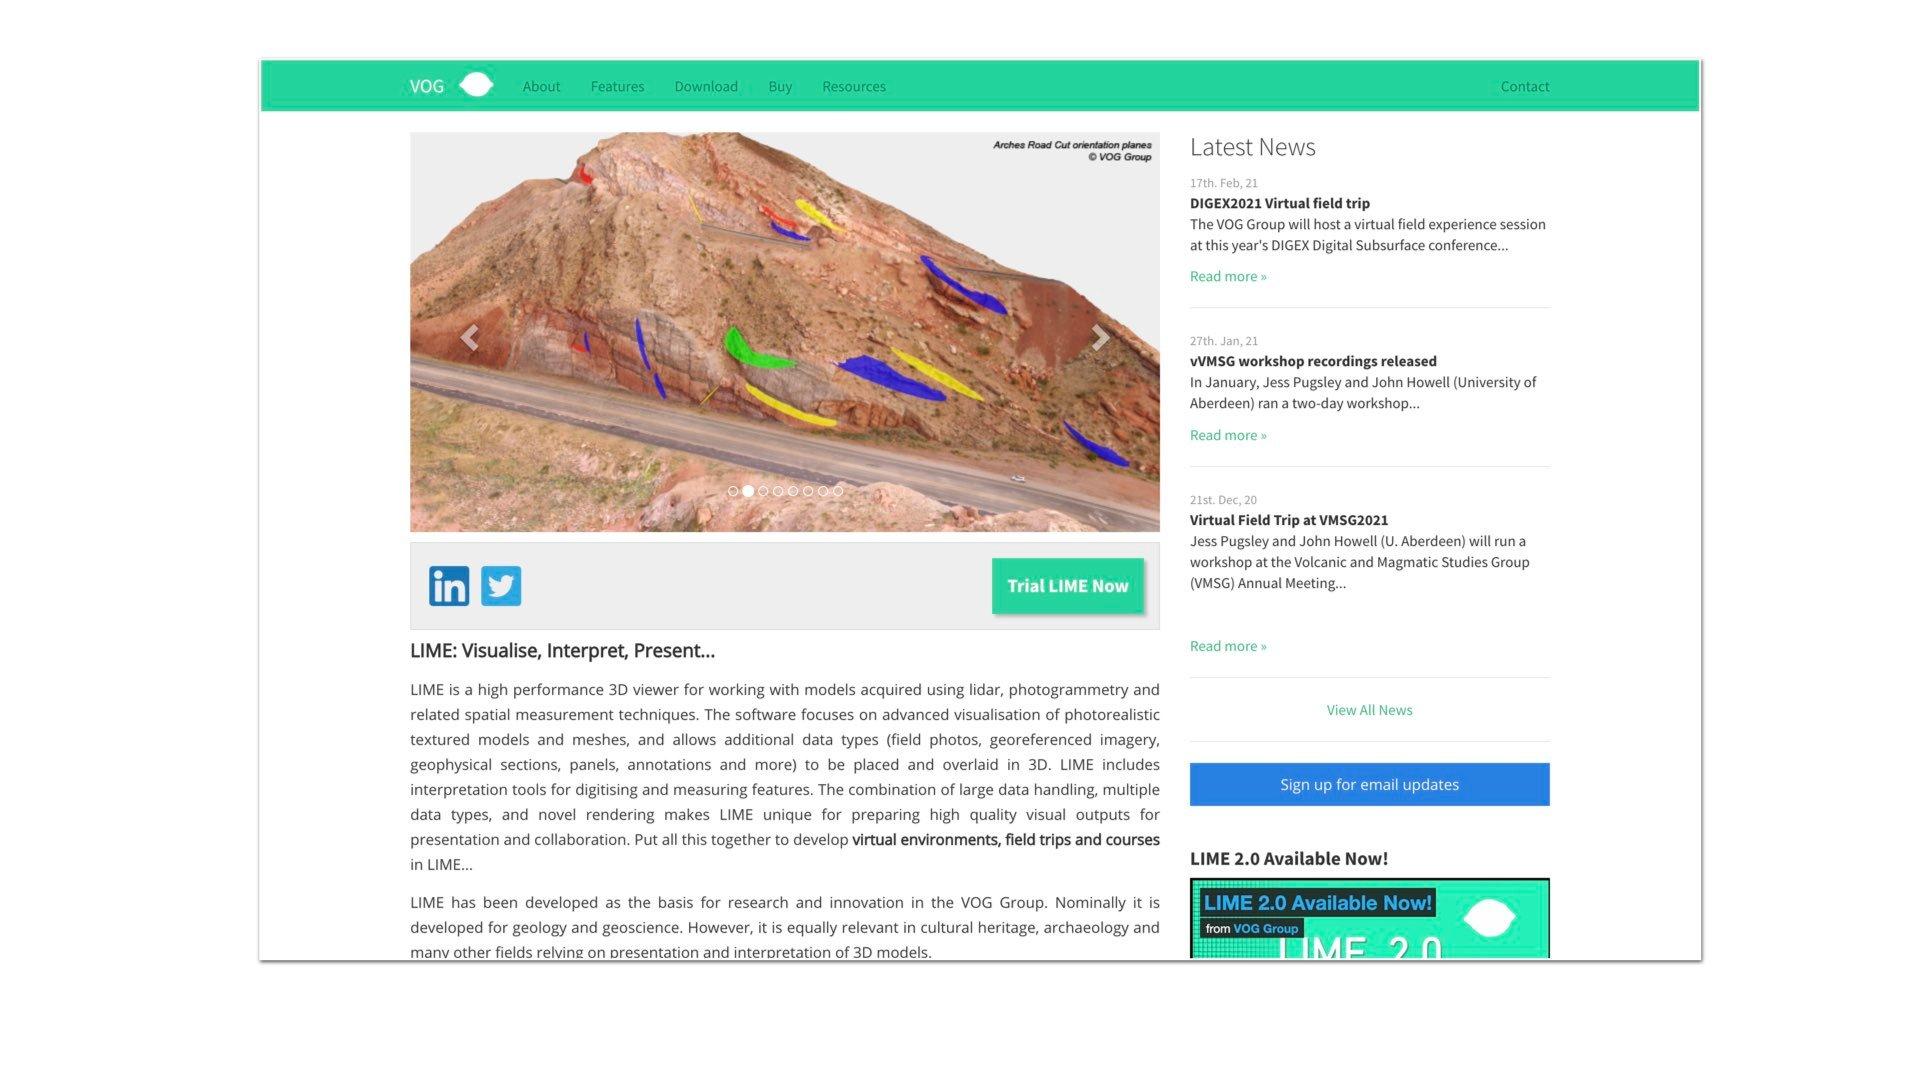 lime blog for drone 3d models